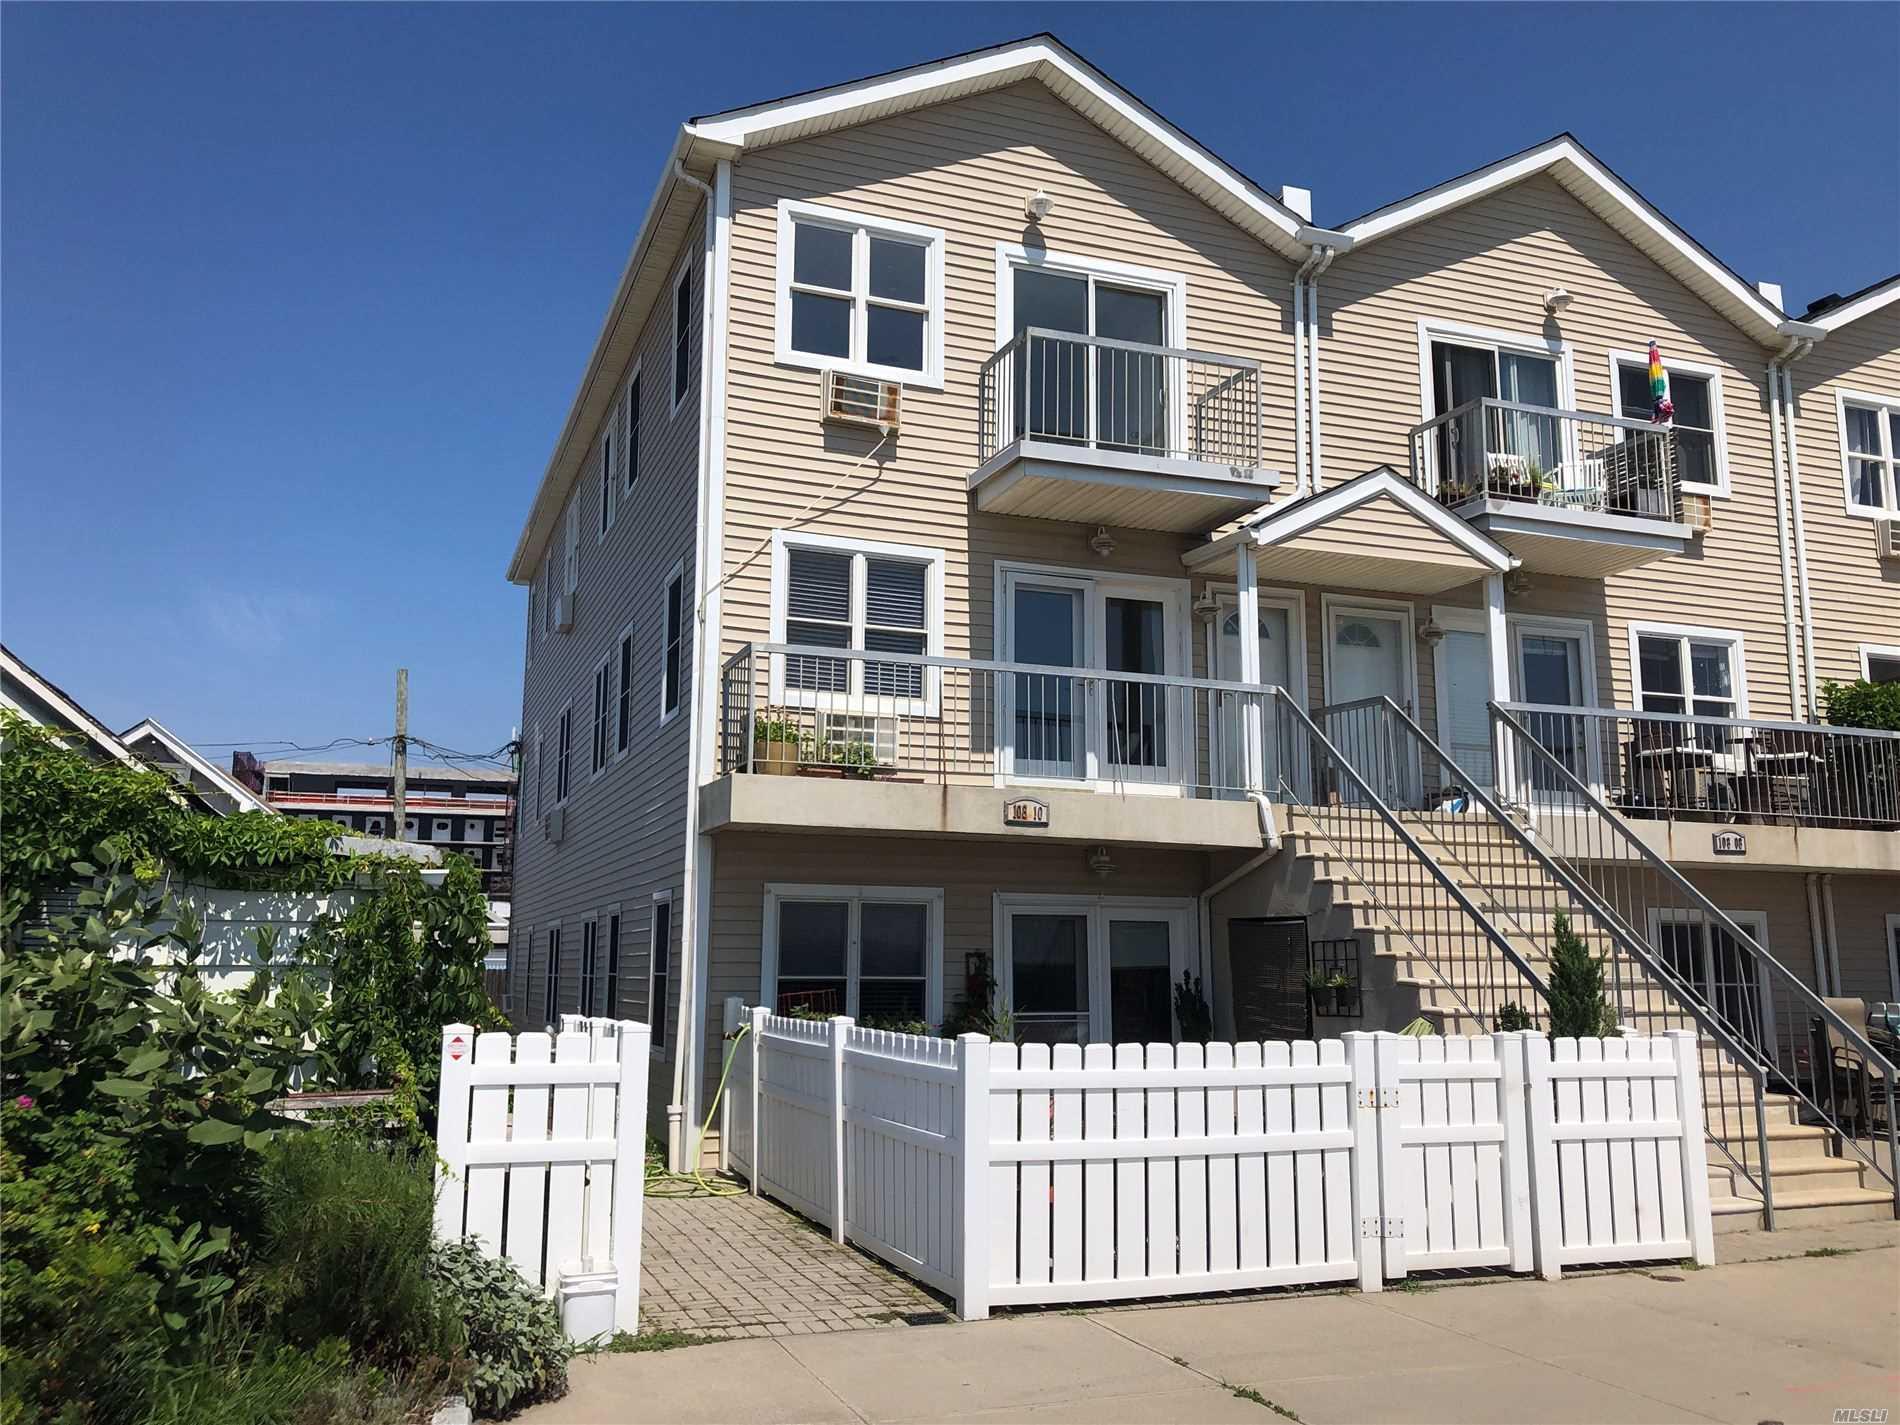 Property for sale at 108-10 W Shore Front Parkway # 3, Rockaway Park NY 11694, Rockaway Park,  New York 11694